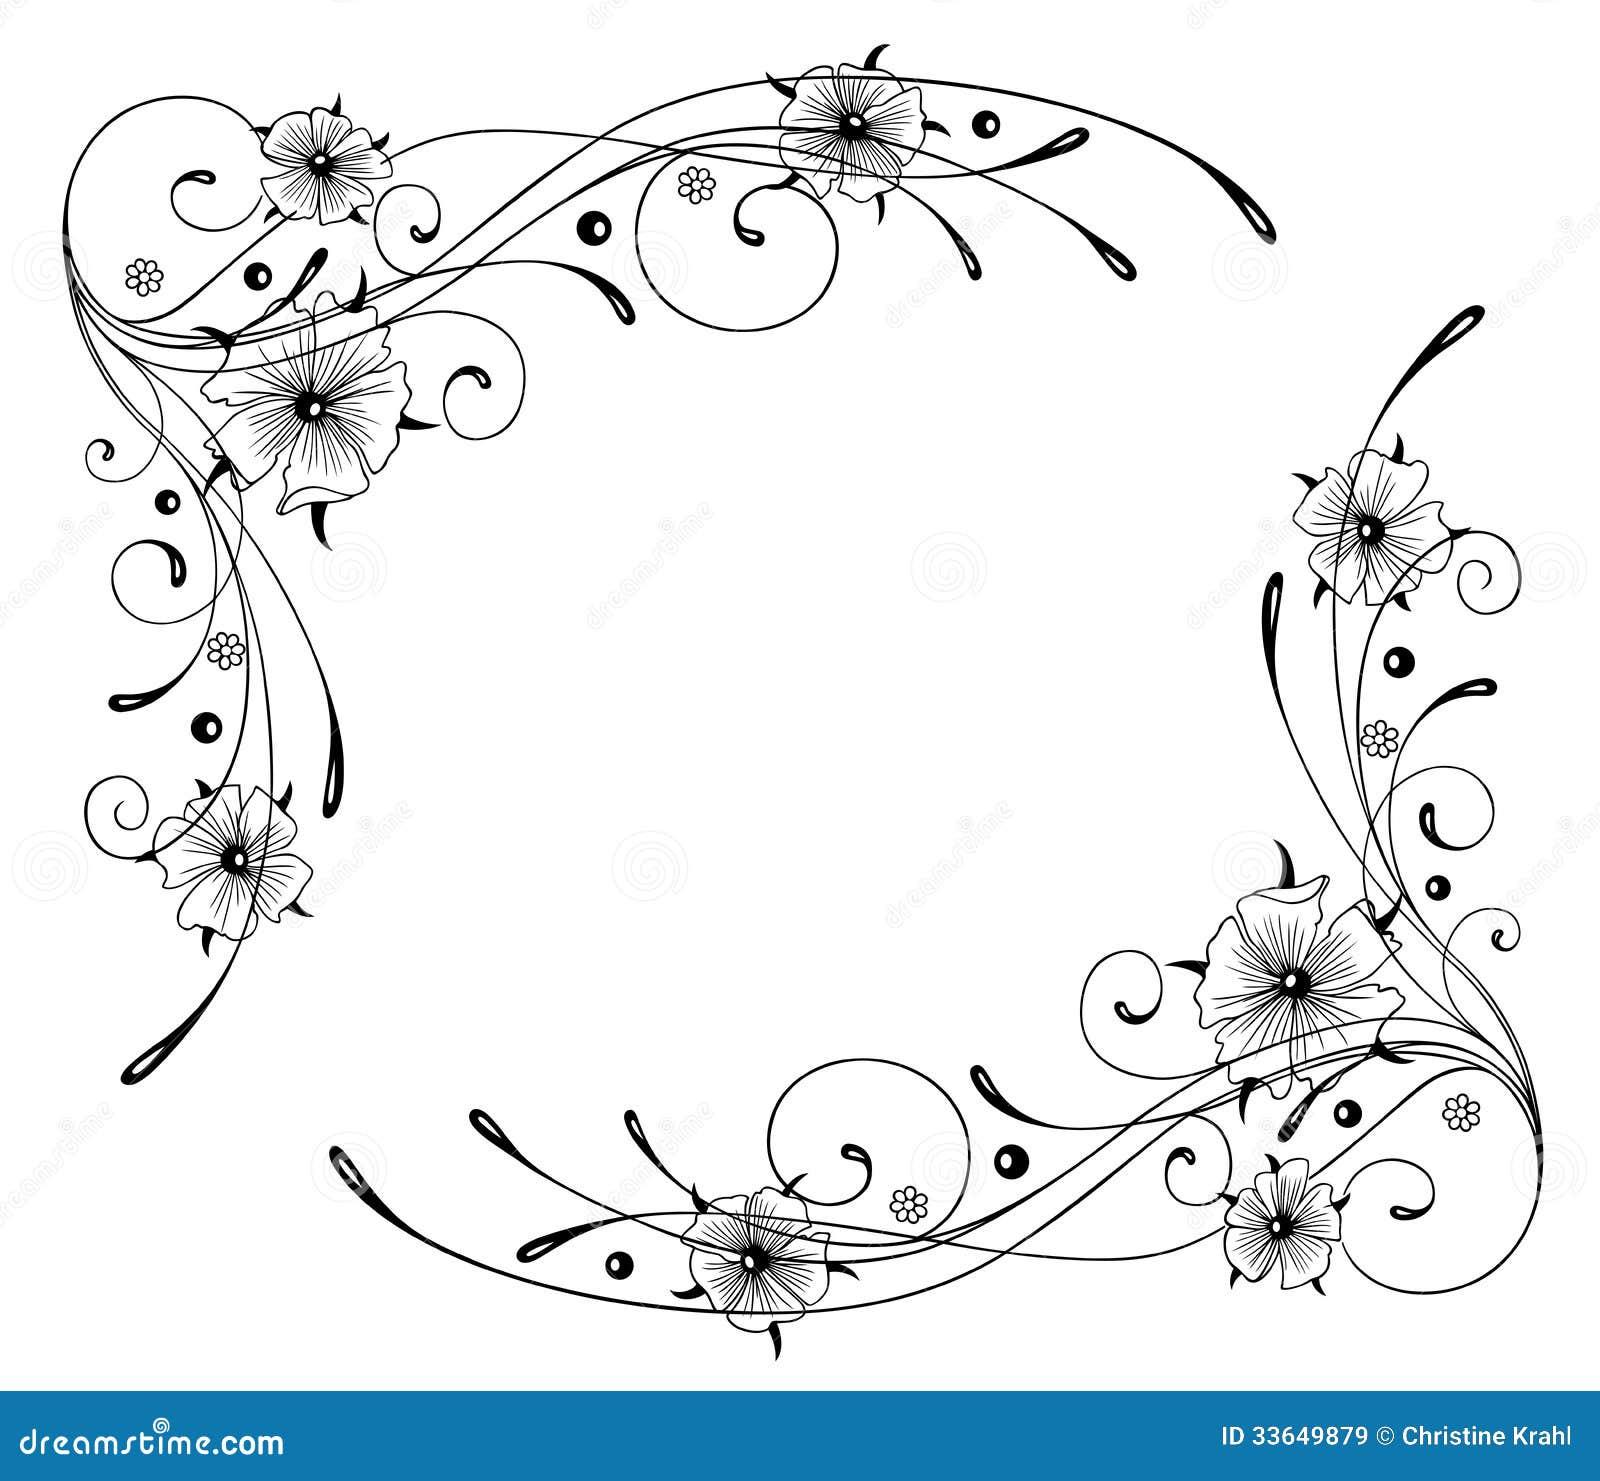 Flower Frame Line Drawing : Nasturtium flowers frame stock vector illustration of